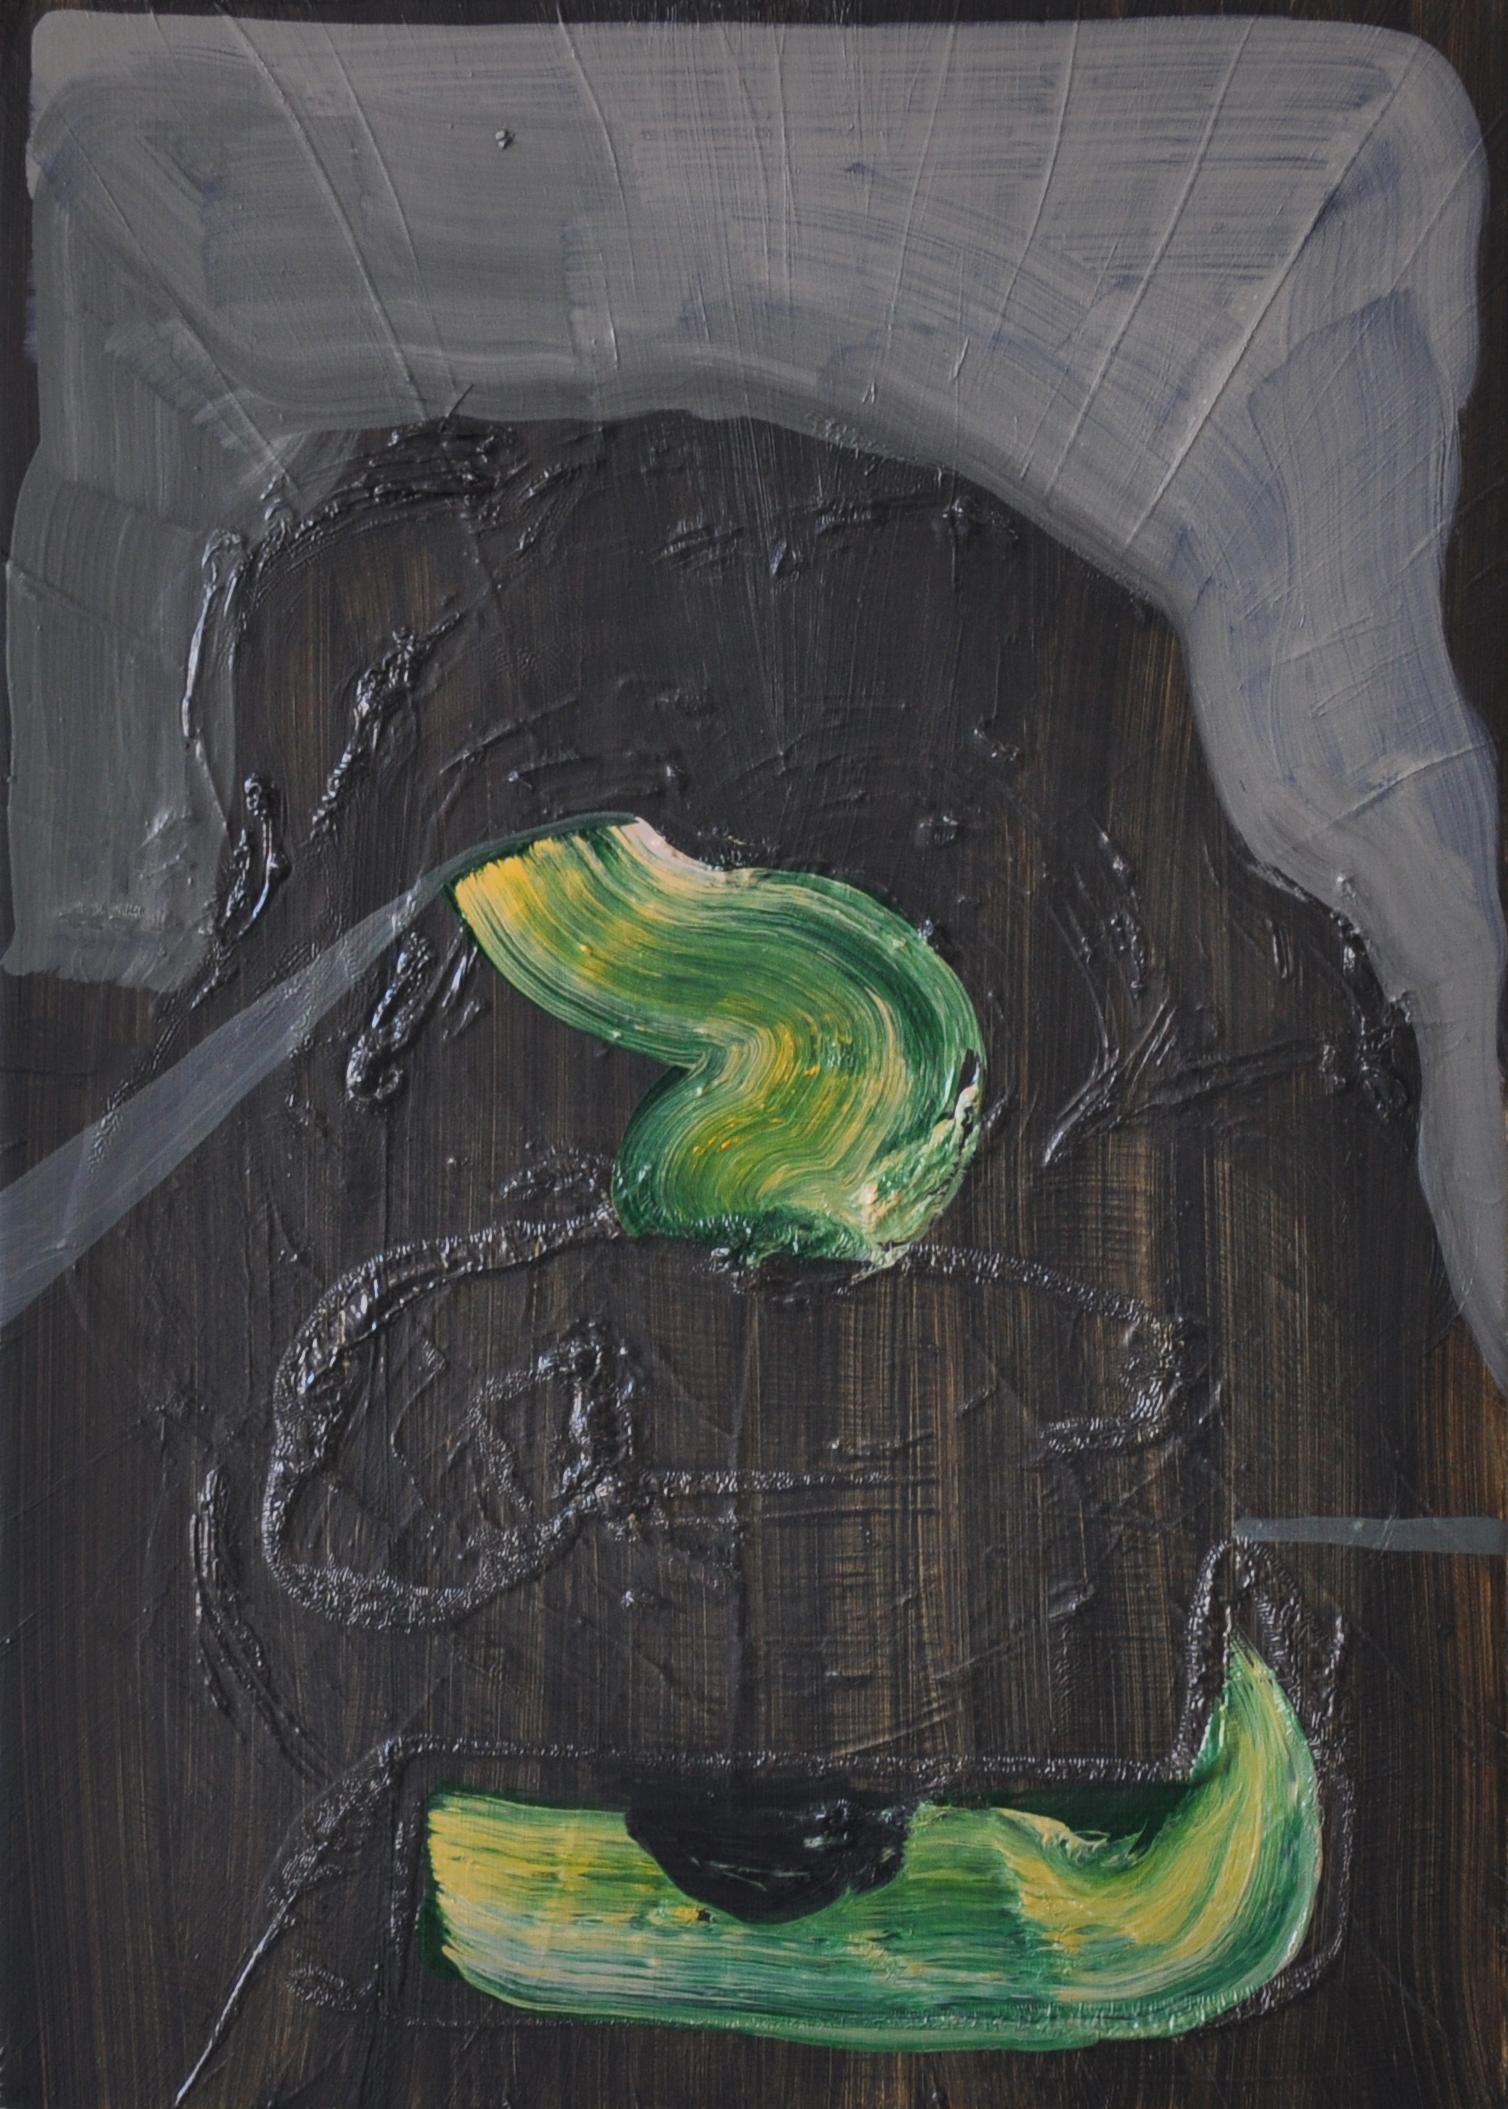 Black Smoker, 2011, Oil on cotton, 35 x 25 cm